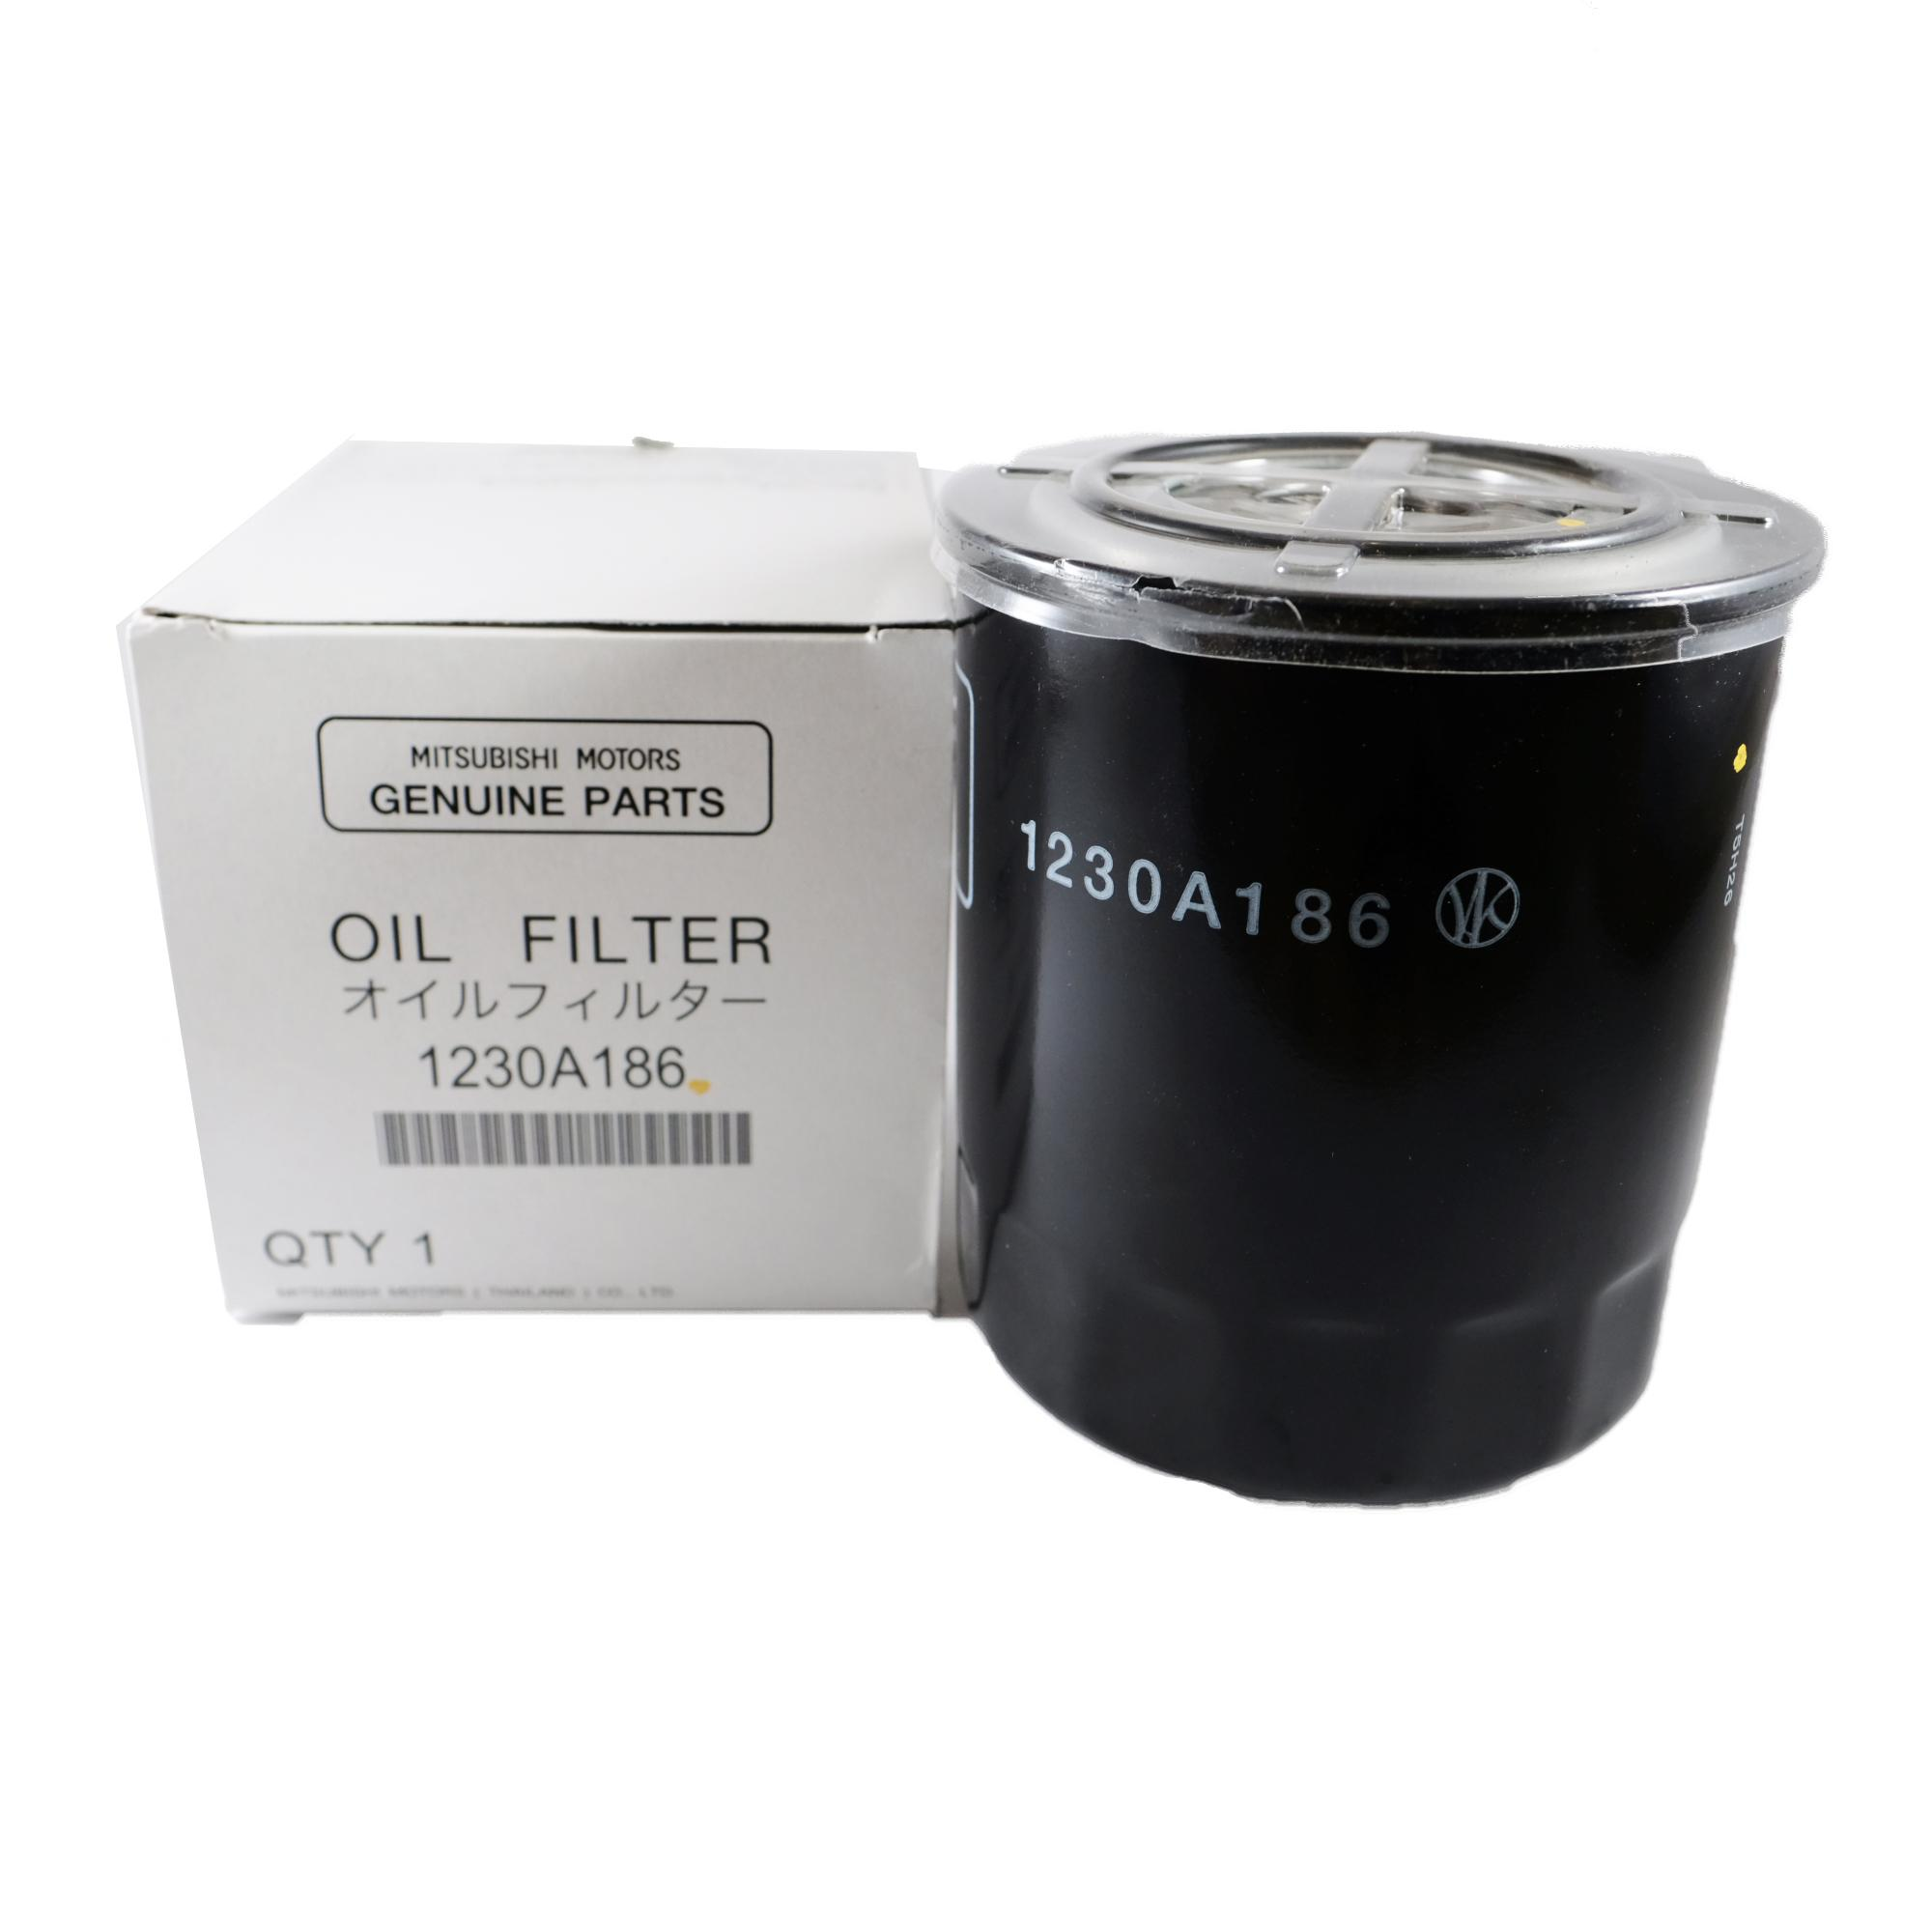 Oil Filter For Sale Adapter Online Brands Prices 2008 Pt Cruiser Fuel Location Genuine Mitsubishi Auto Parts 1230a186 Montero 2015